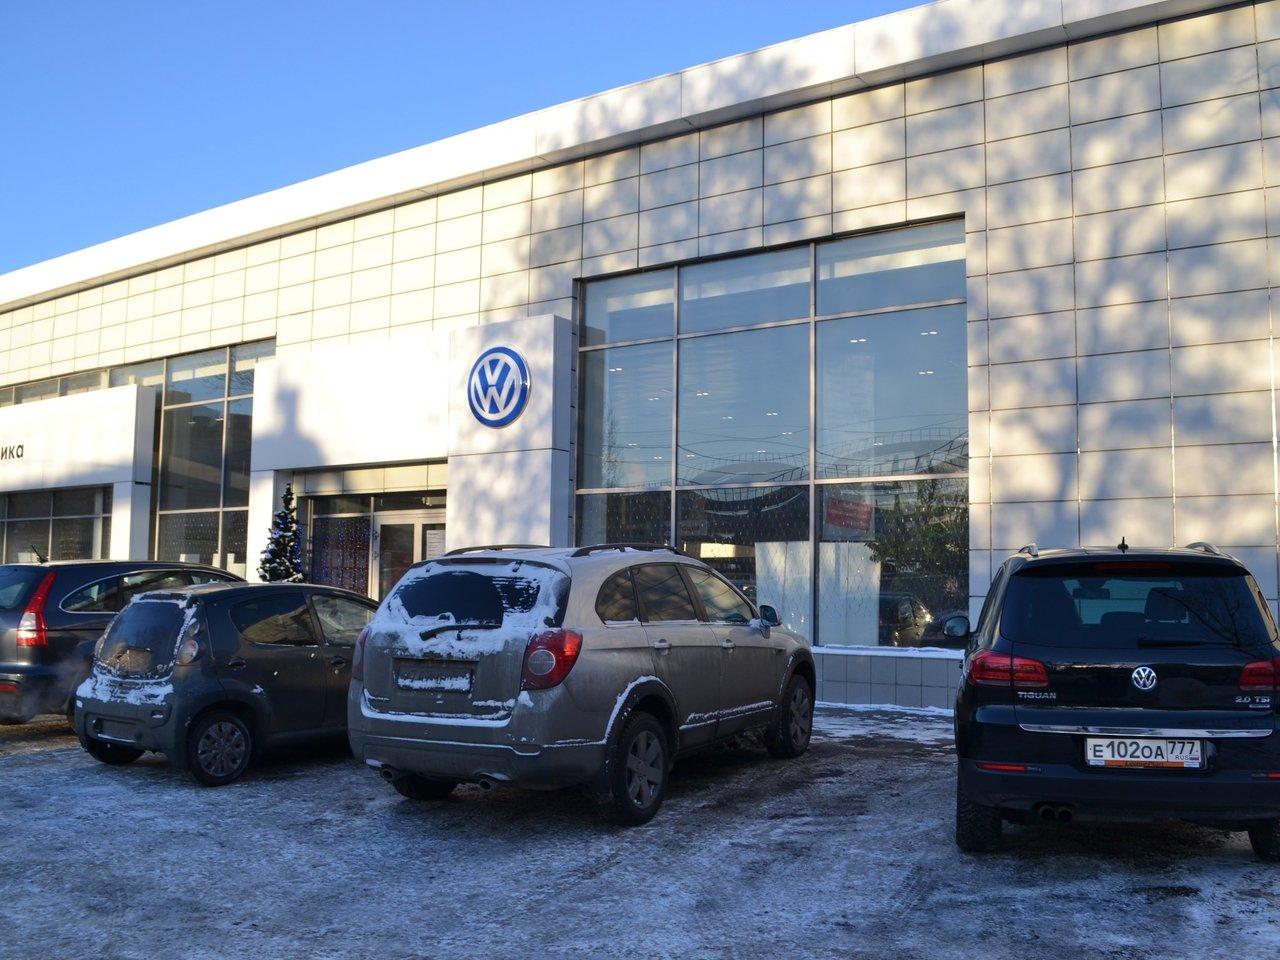 Германика автосалон москва ломбарды москвы распродажа шуб